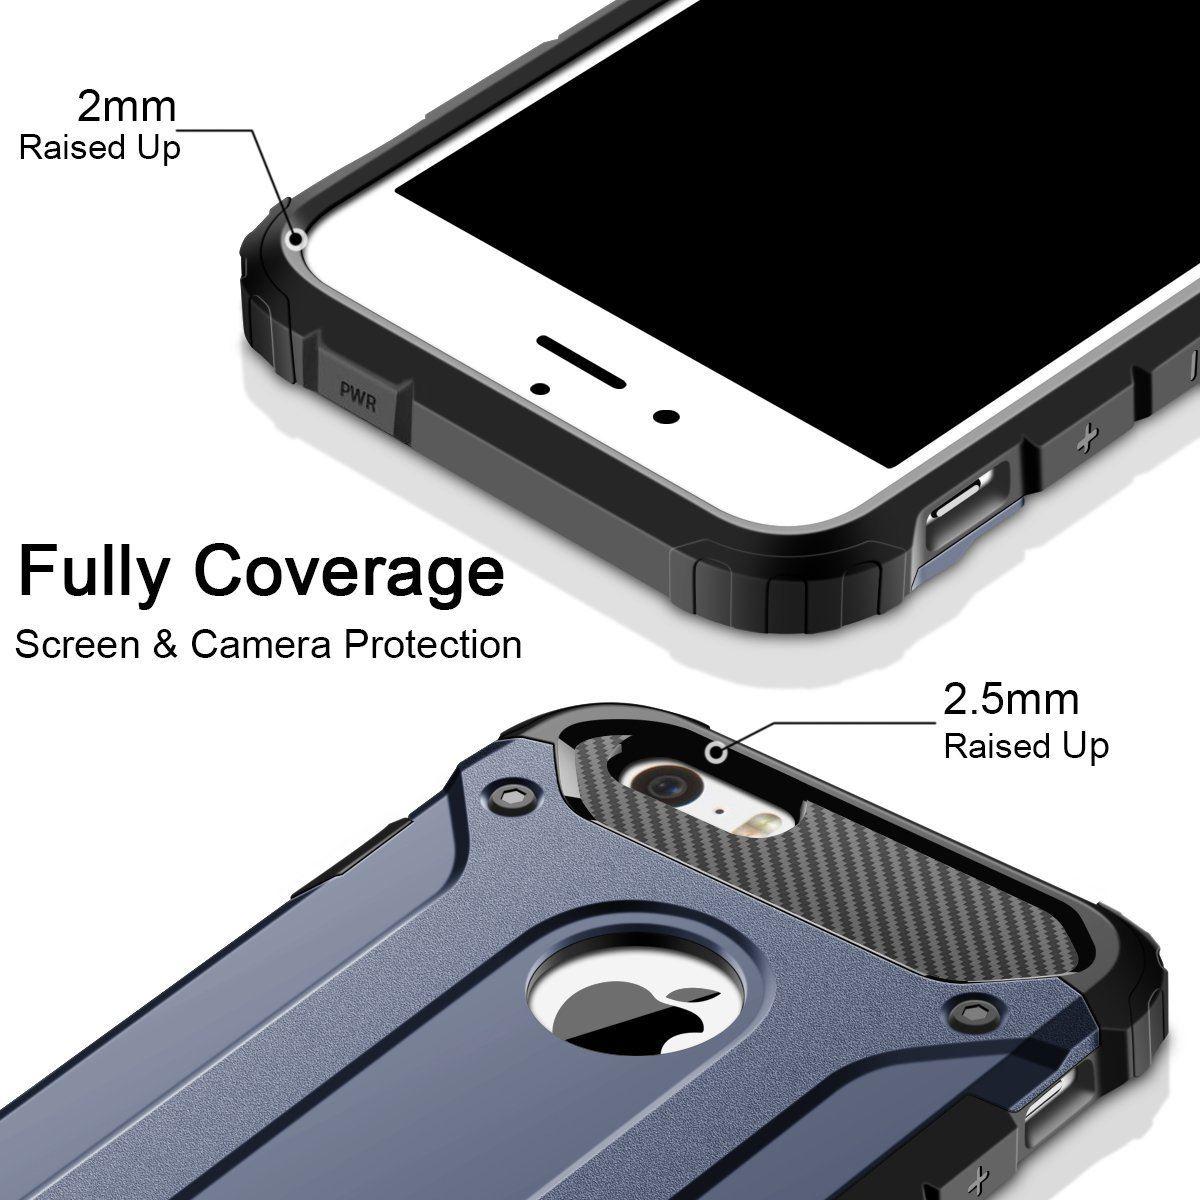 thumbnail 75 - For Apple iPhone 11 Pro Max XR Xs X 8 7 Plus 6 5 Se Case Cover Tough Armor